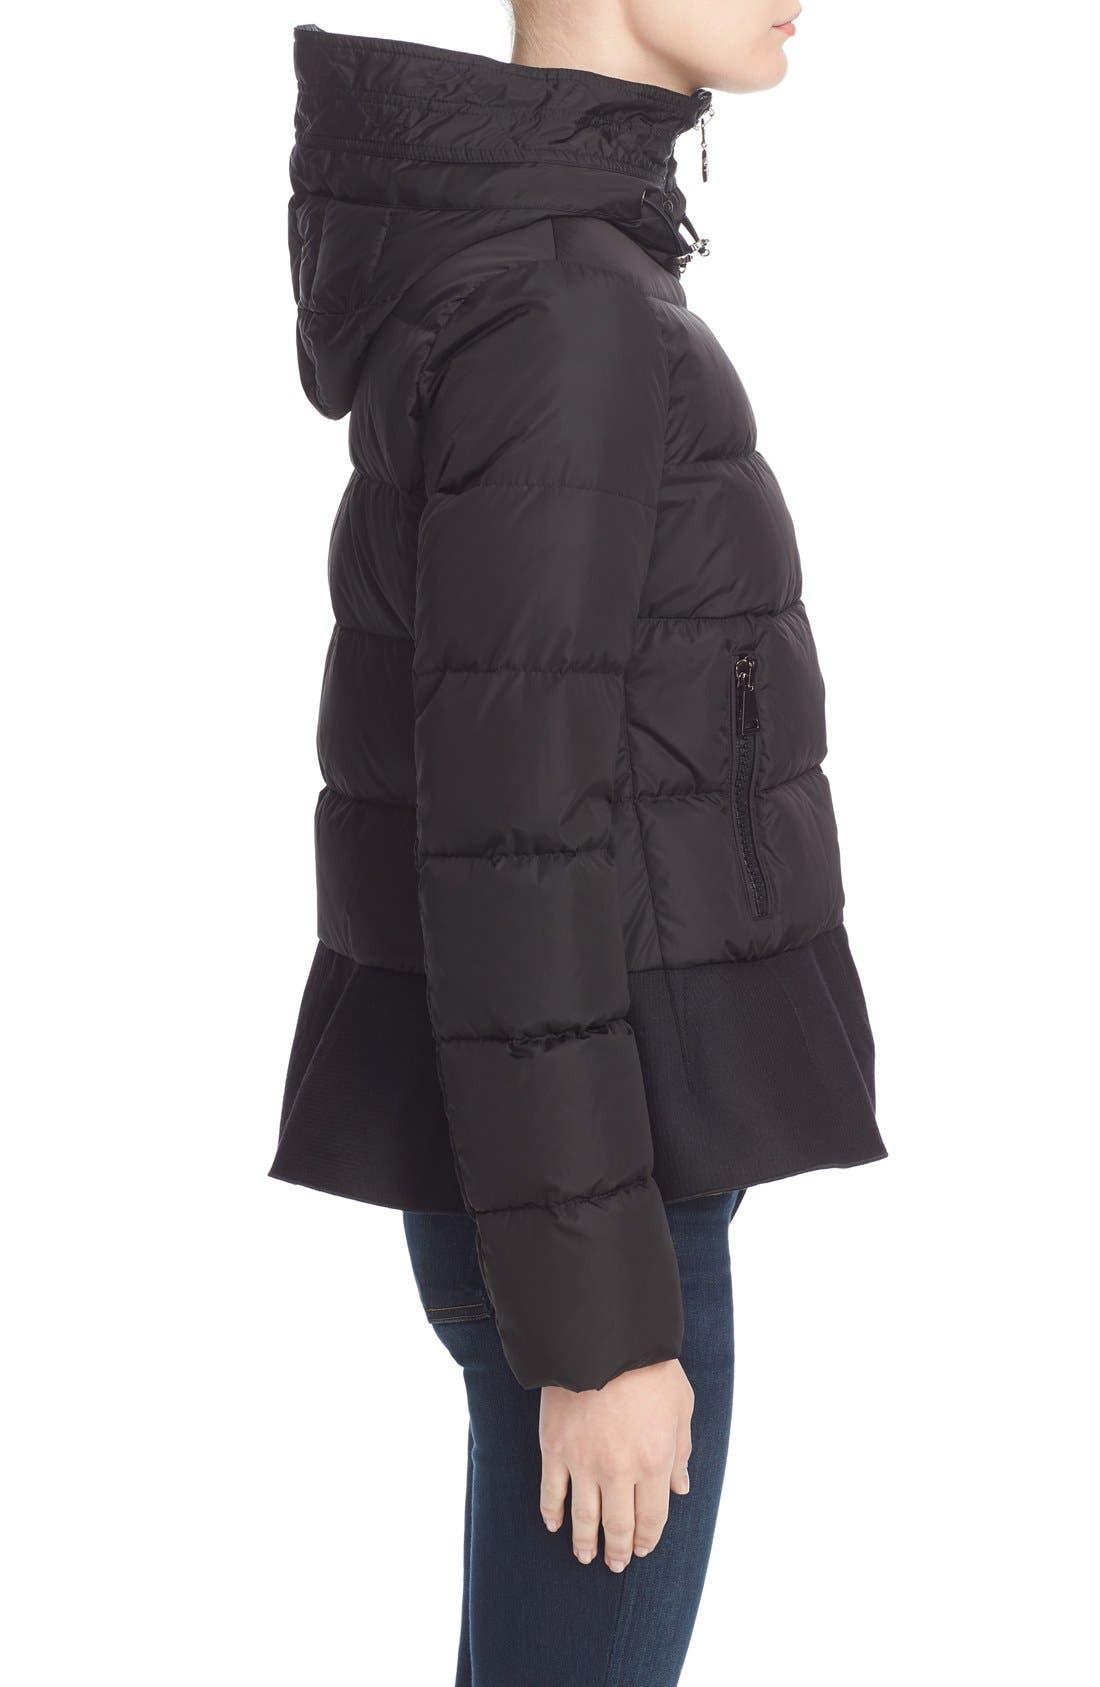 Nesea Peplum Hem Down Puffer Jacket,                             Alternate thumbnail 6, color,                             Black